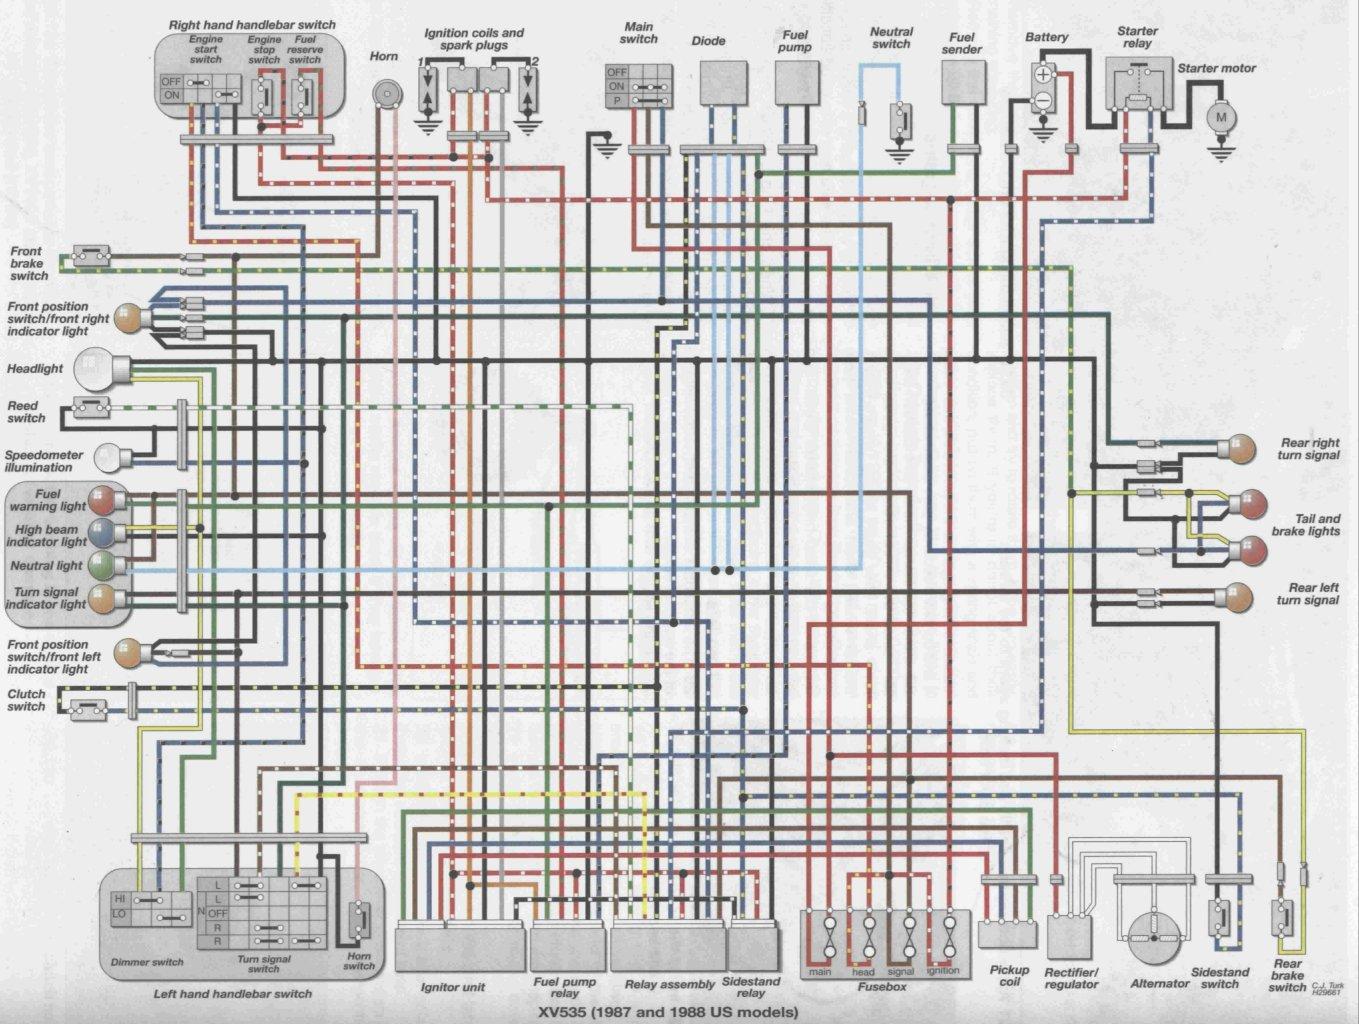 A Wiring Diagram For 83 Shovelhead Library Turn Signal 1984 Honda Vt500c Color Diagrams Data Base Rh Alfrescosolutions Co Shadow